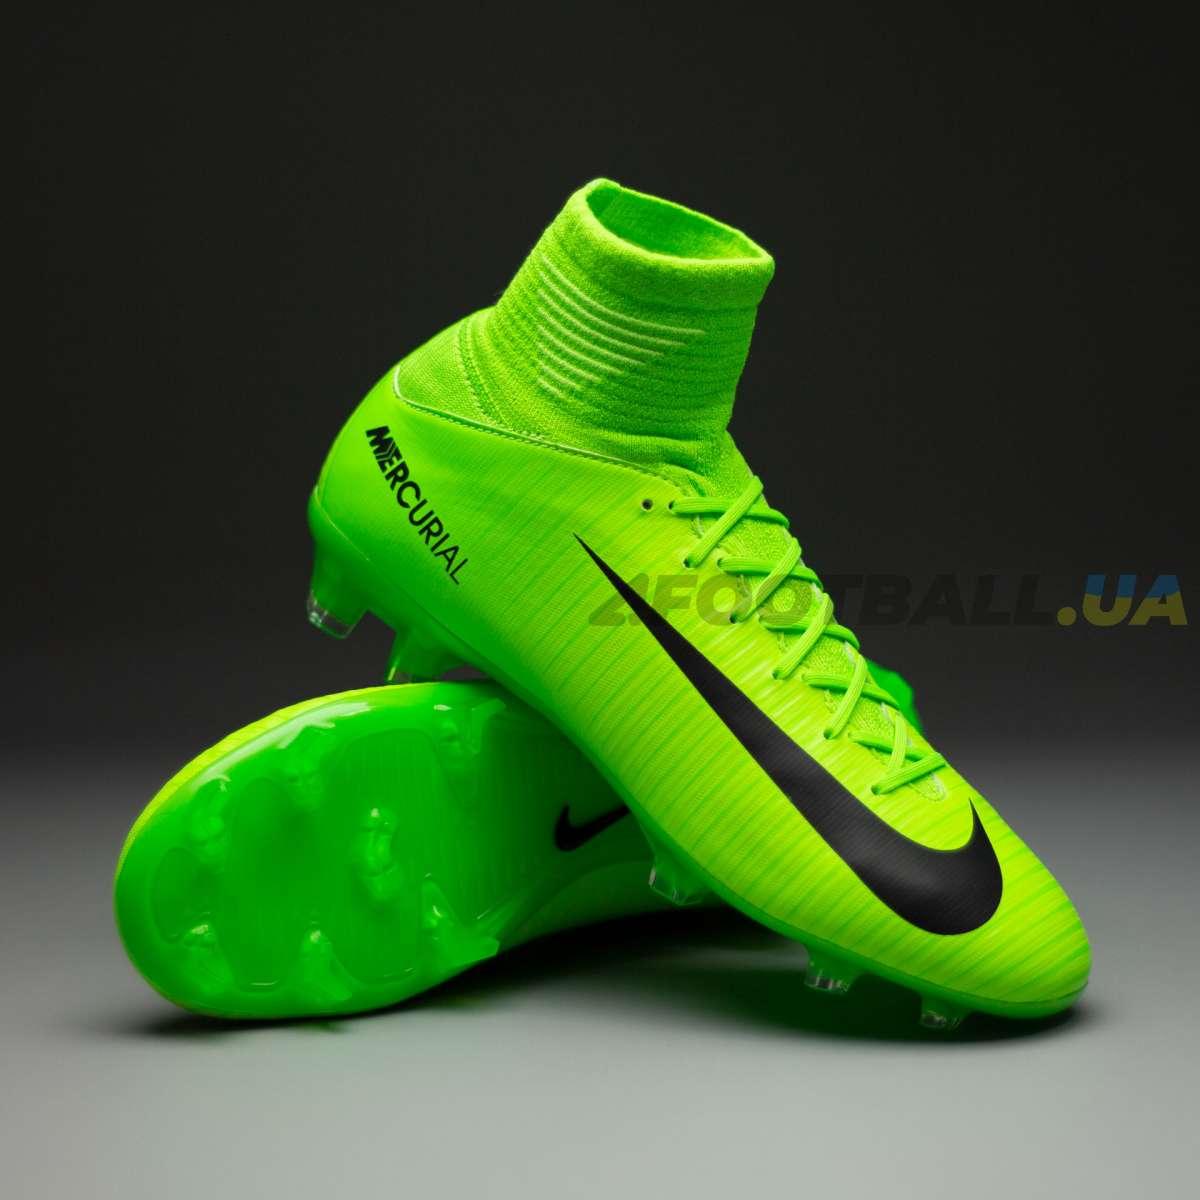 f0d6ae5f Детские бутсы Nike Mercurial Superfly 831943-303 купить на 4football ...